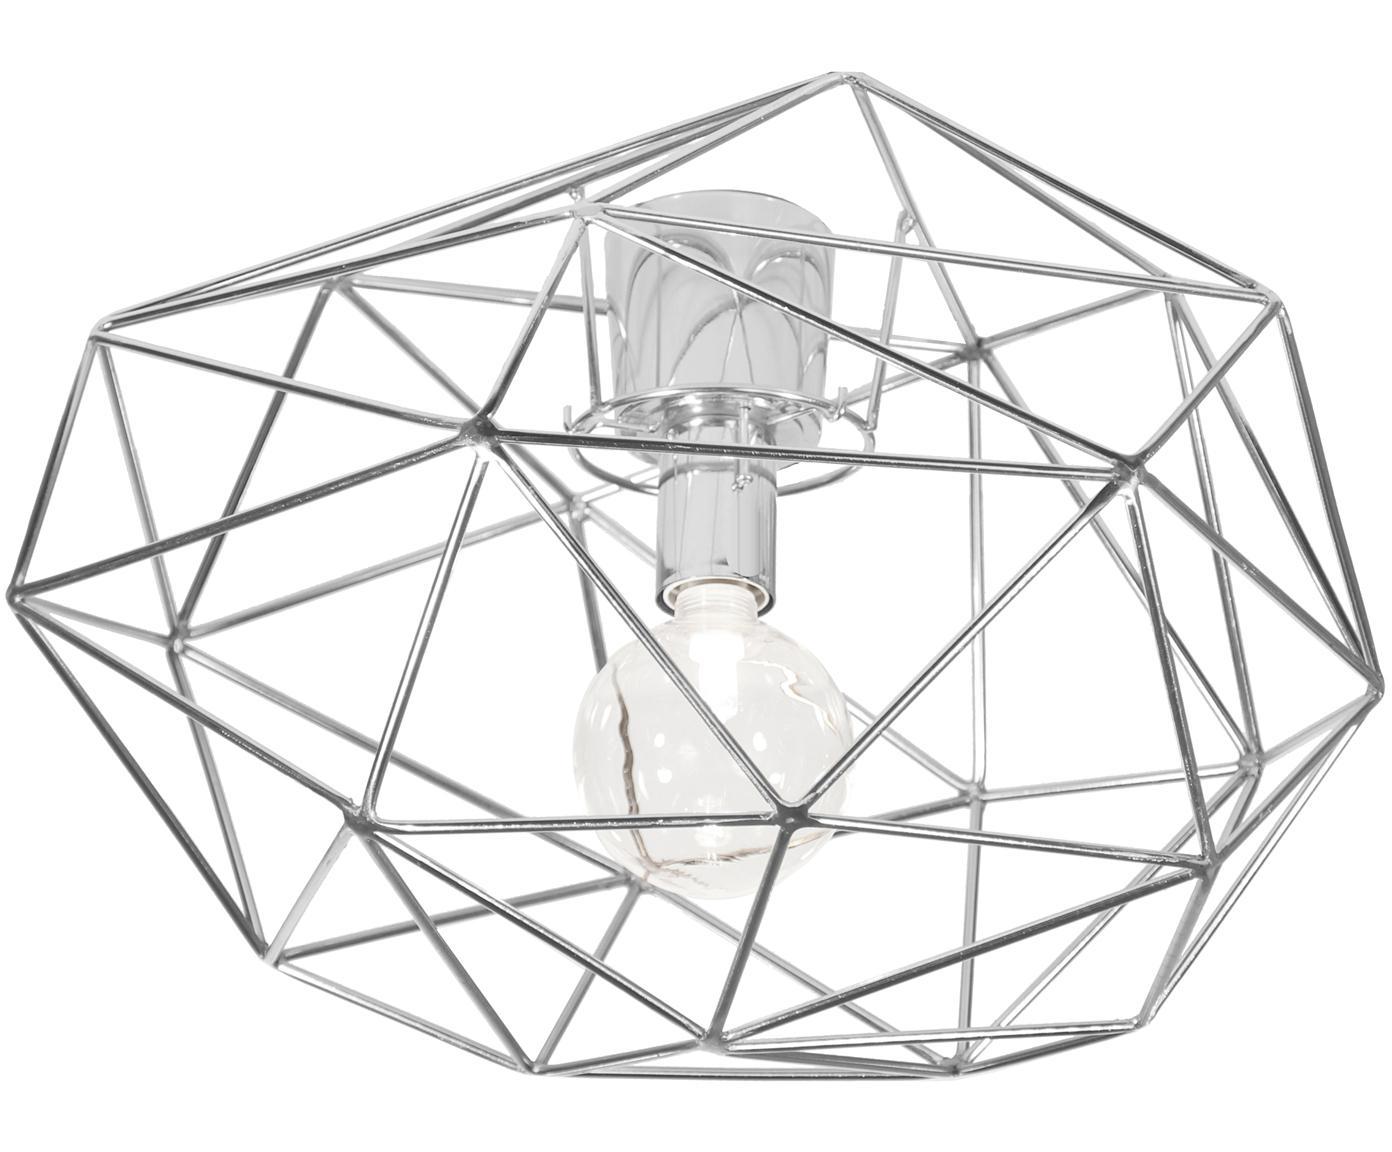 Plafoniera argentata Diamond, Ottone, cromato, Cromo, Ø 50 x Alt. 32 cm